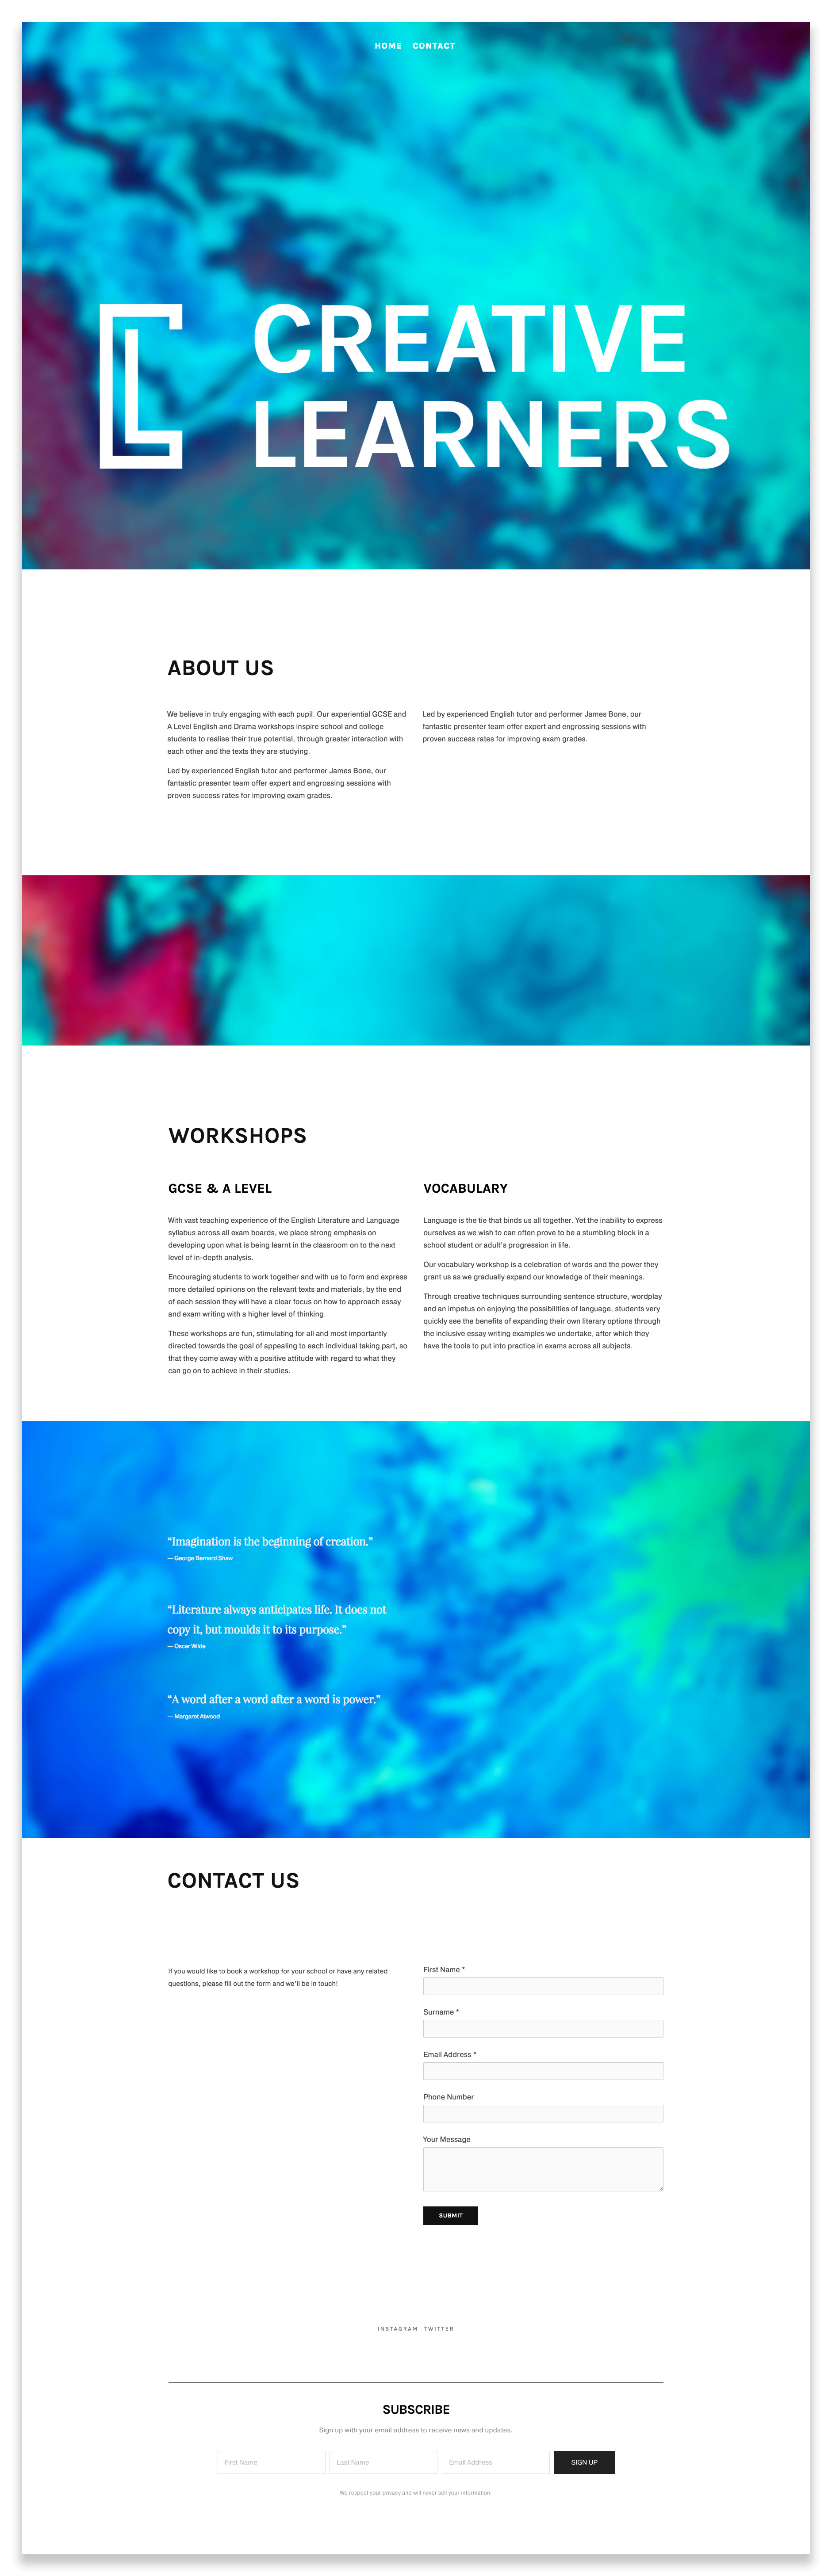 creative-learners-by-also-agency-website-2.jpg